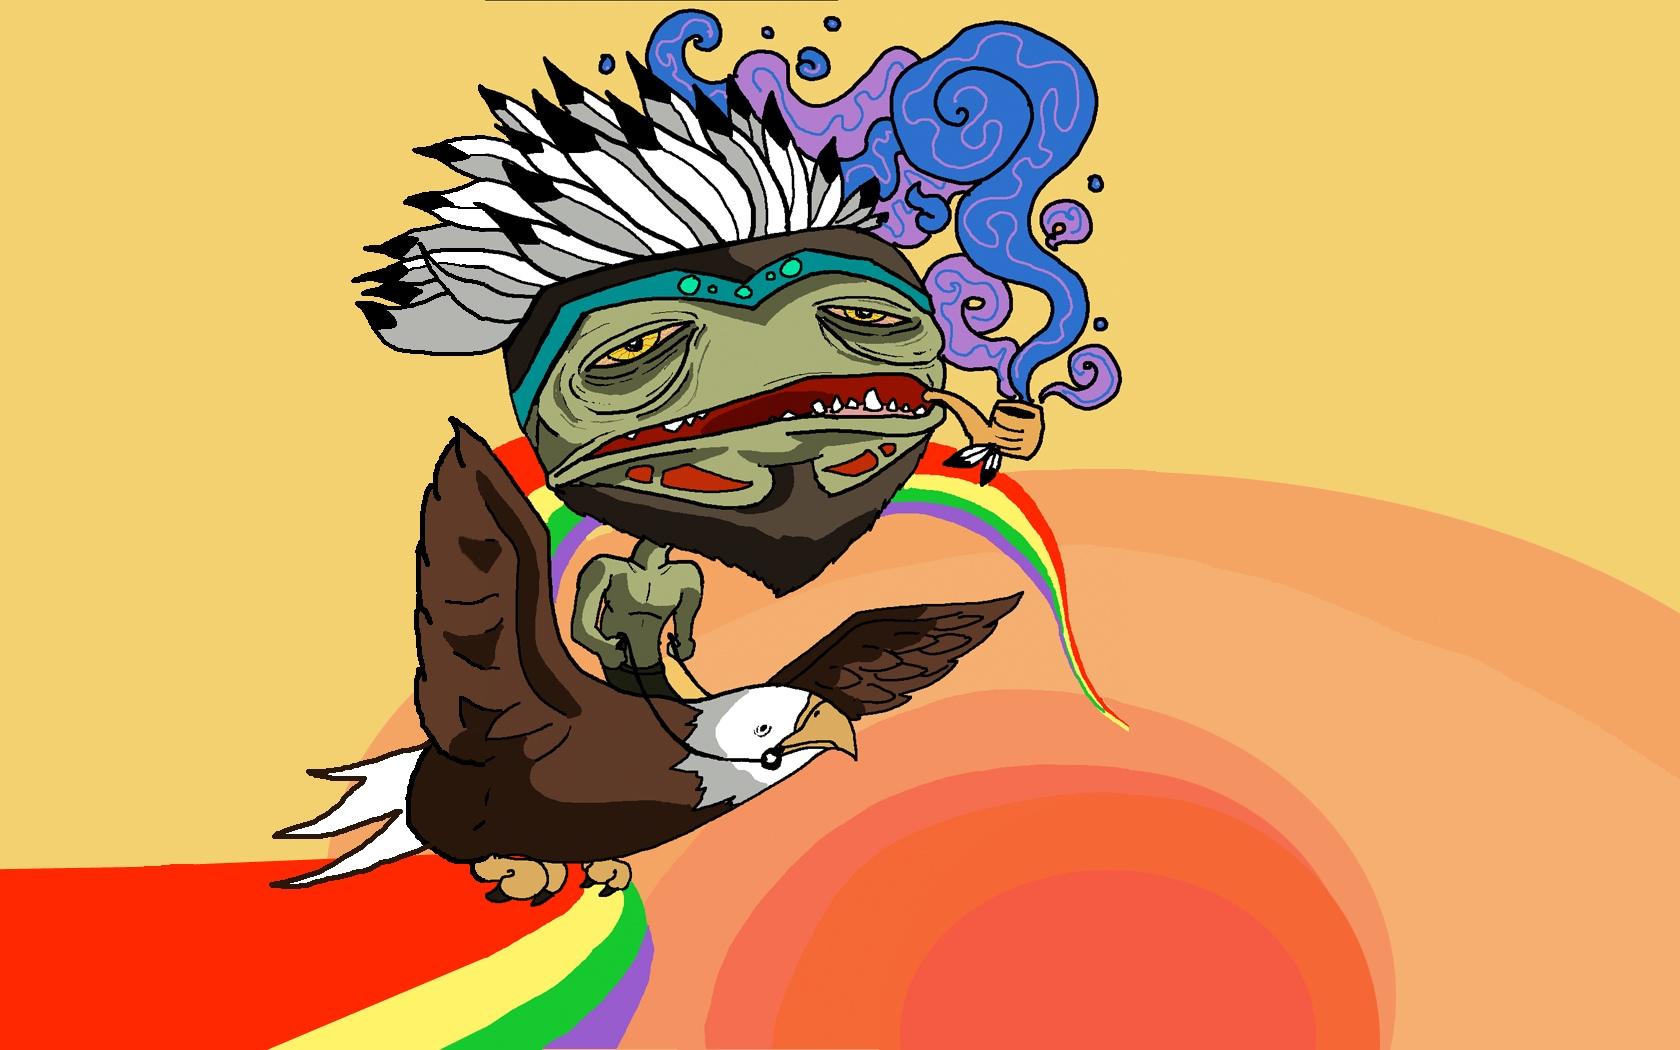 Triipy clipart desktop background Artistic Backgrounds Wallpapers Aztec Wallpaper